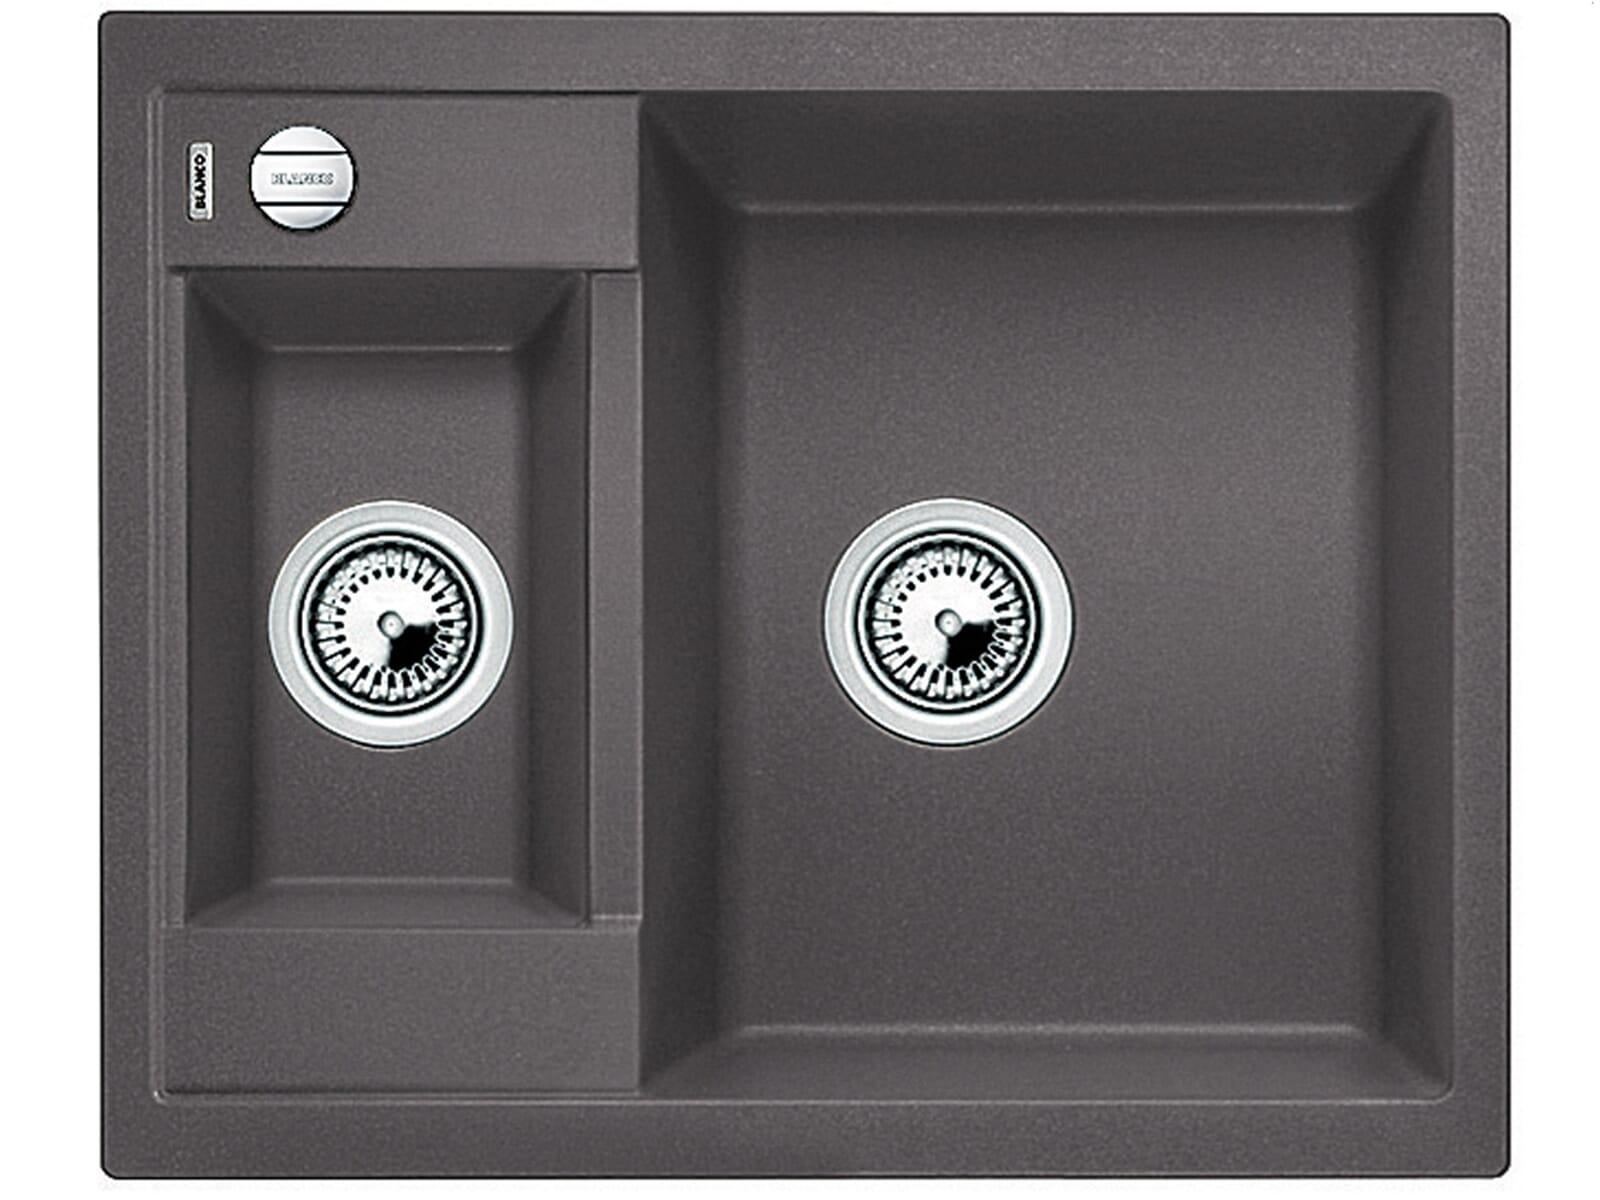 blanco metra 6 felsgrau granit sp le f r 248 90 eur shop. Black Bedroom Furniture Sets. Home Design Ideas